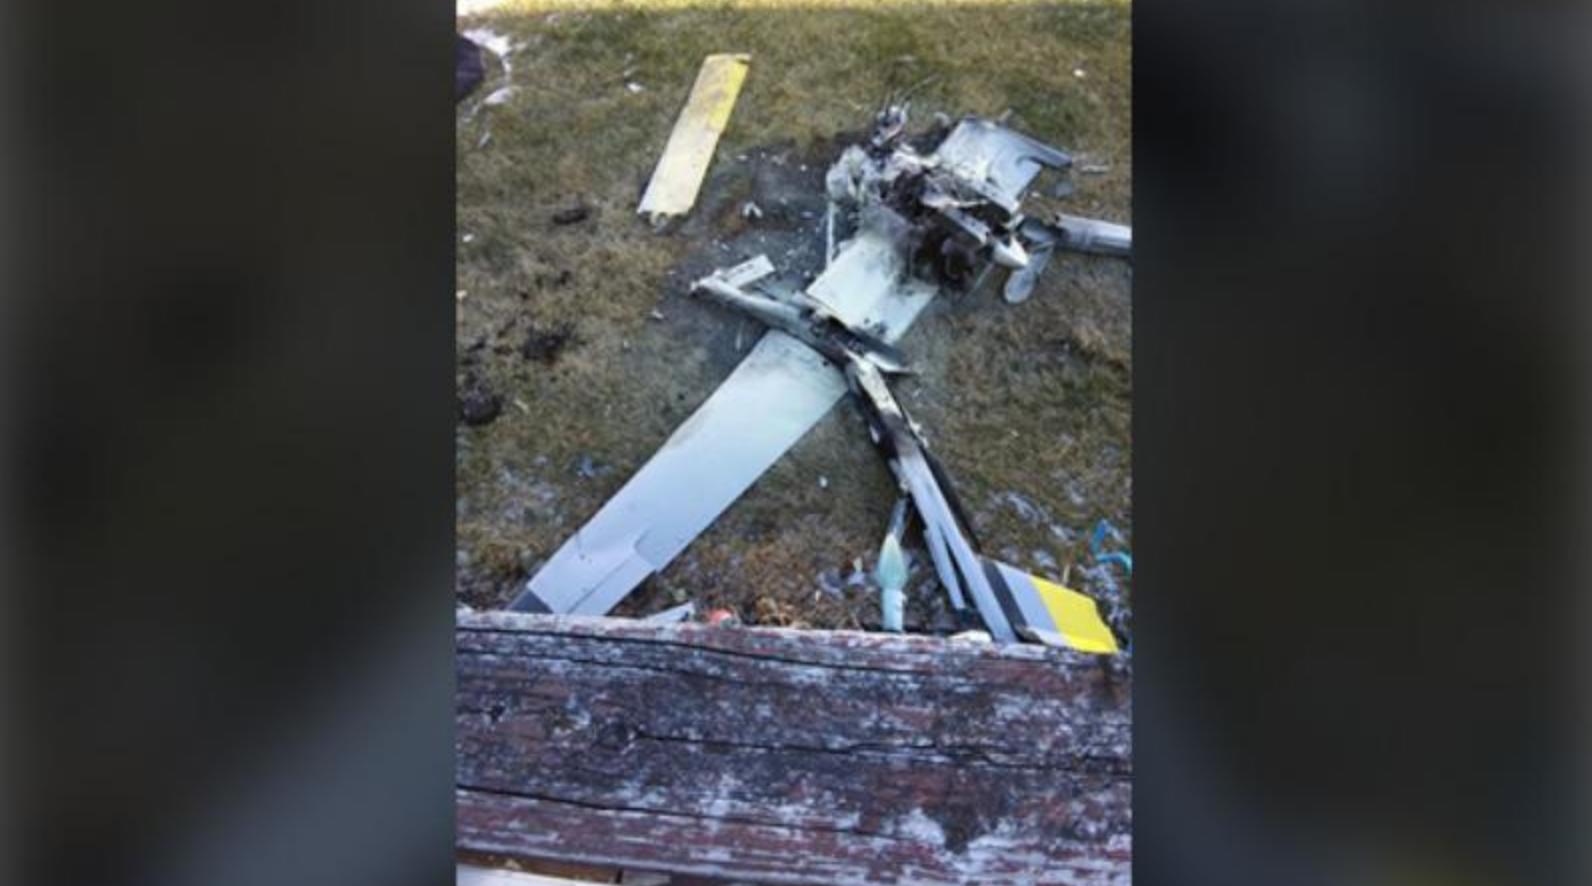 University of Iowa lab drone crashes near Iowa City Airport